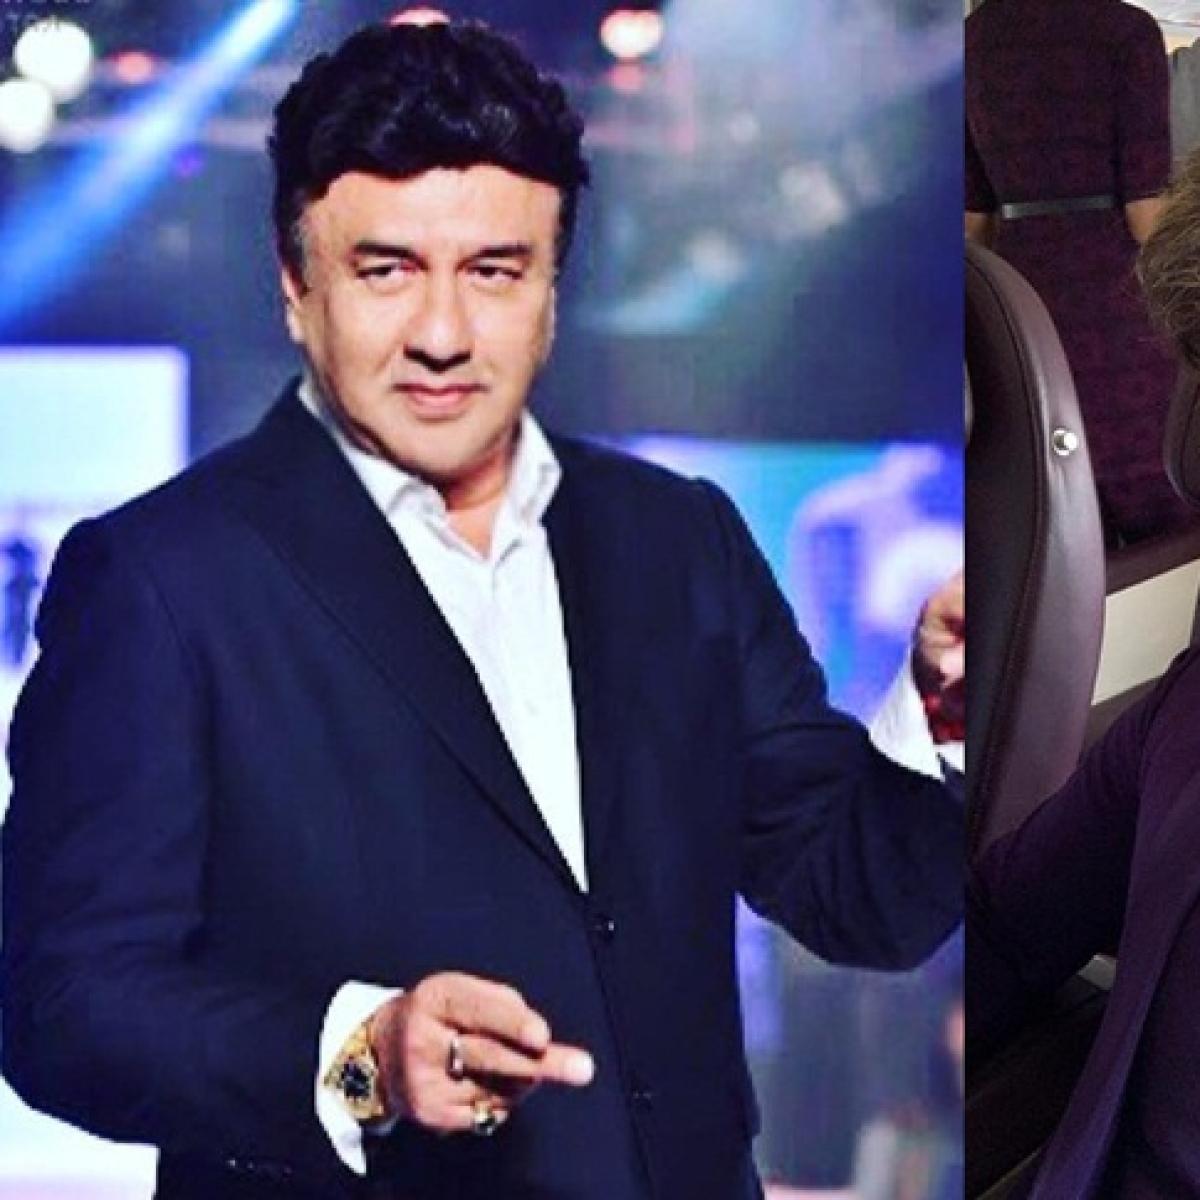 After #MeToo accused Anu Malik's exit, Himesh Reshammiya to judge 'Indian Idol' season 11